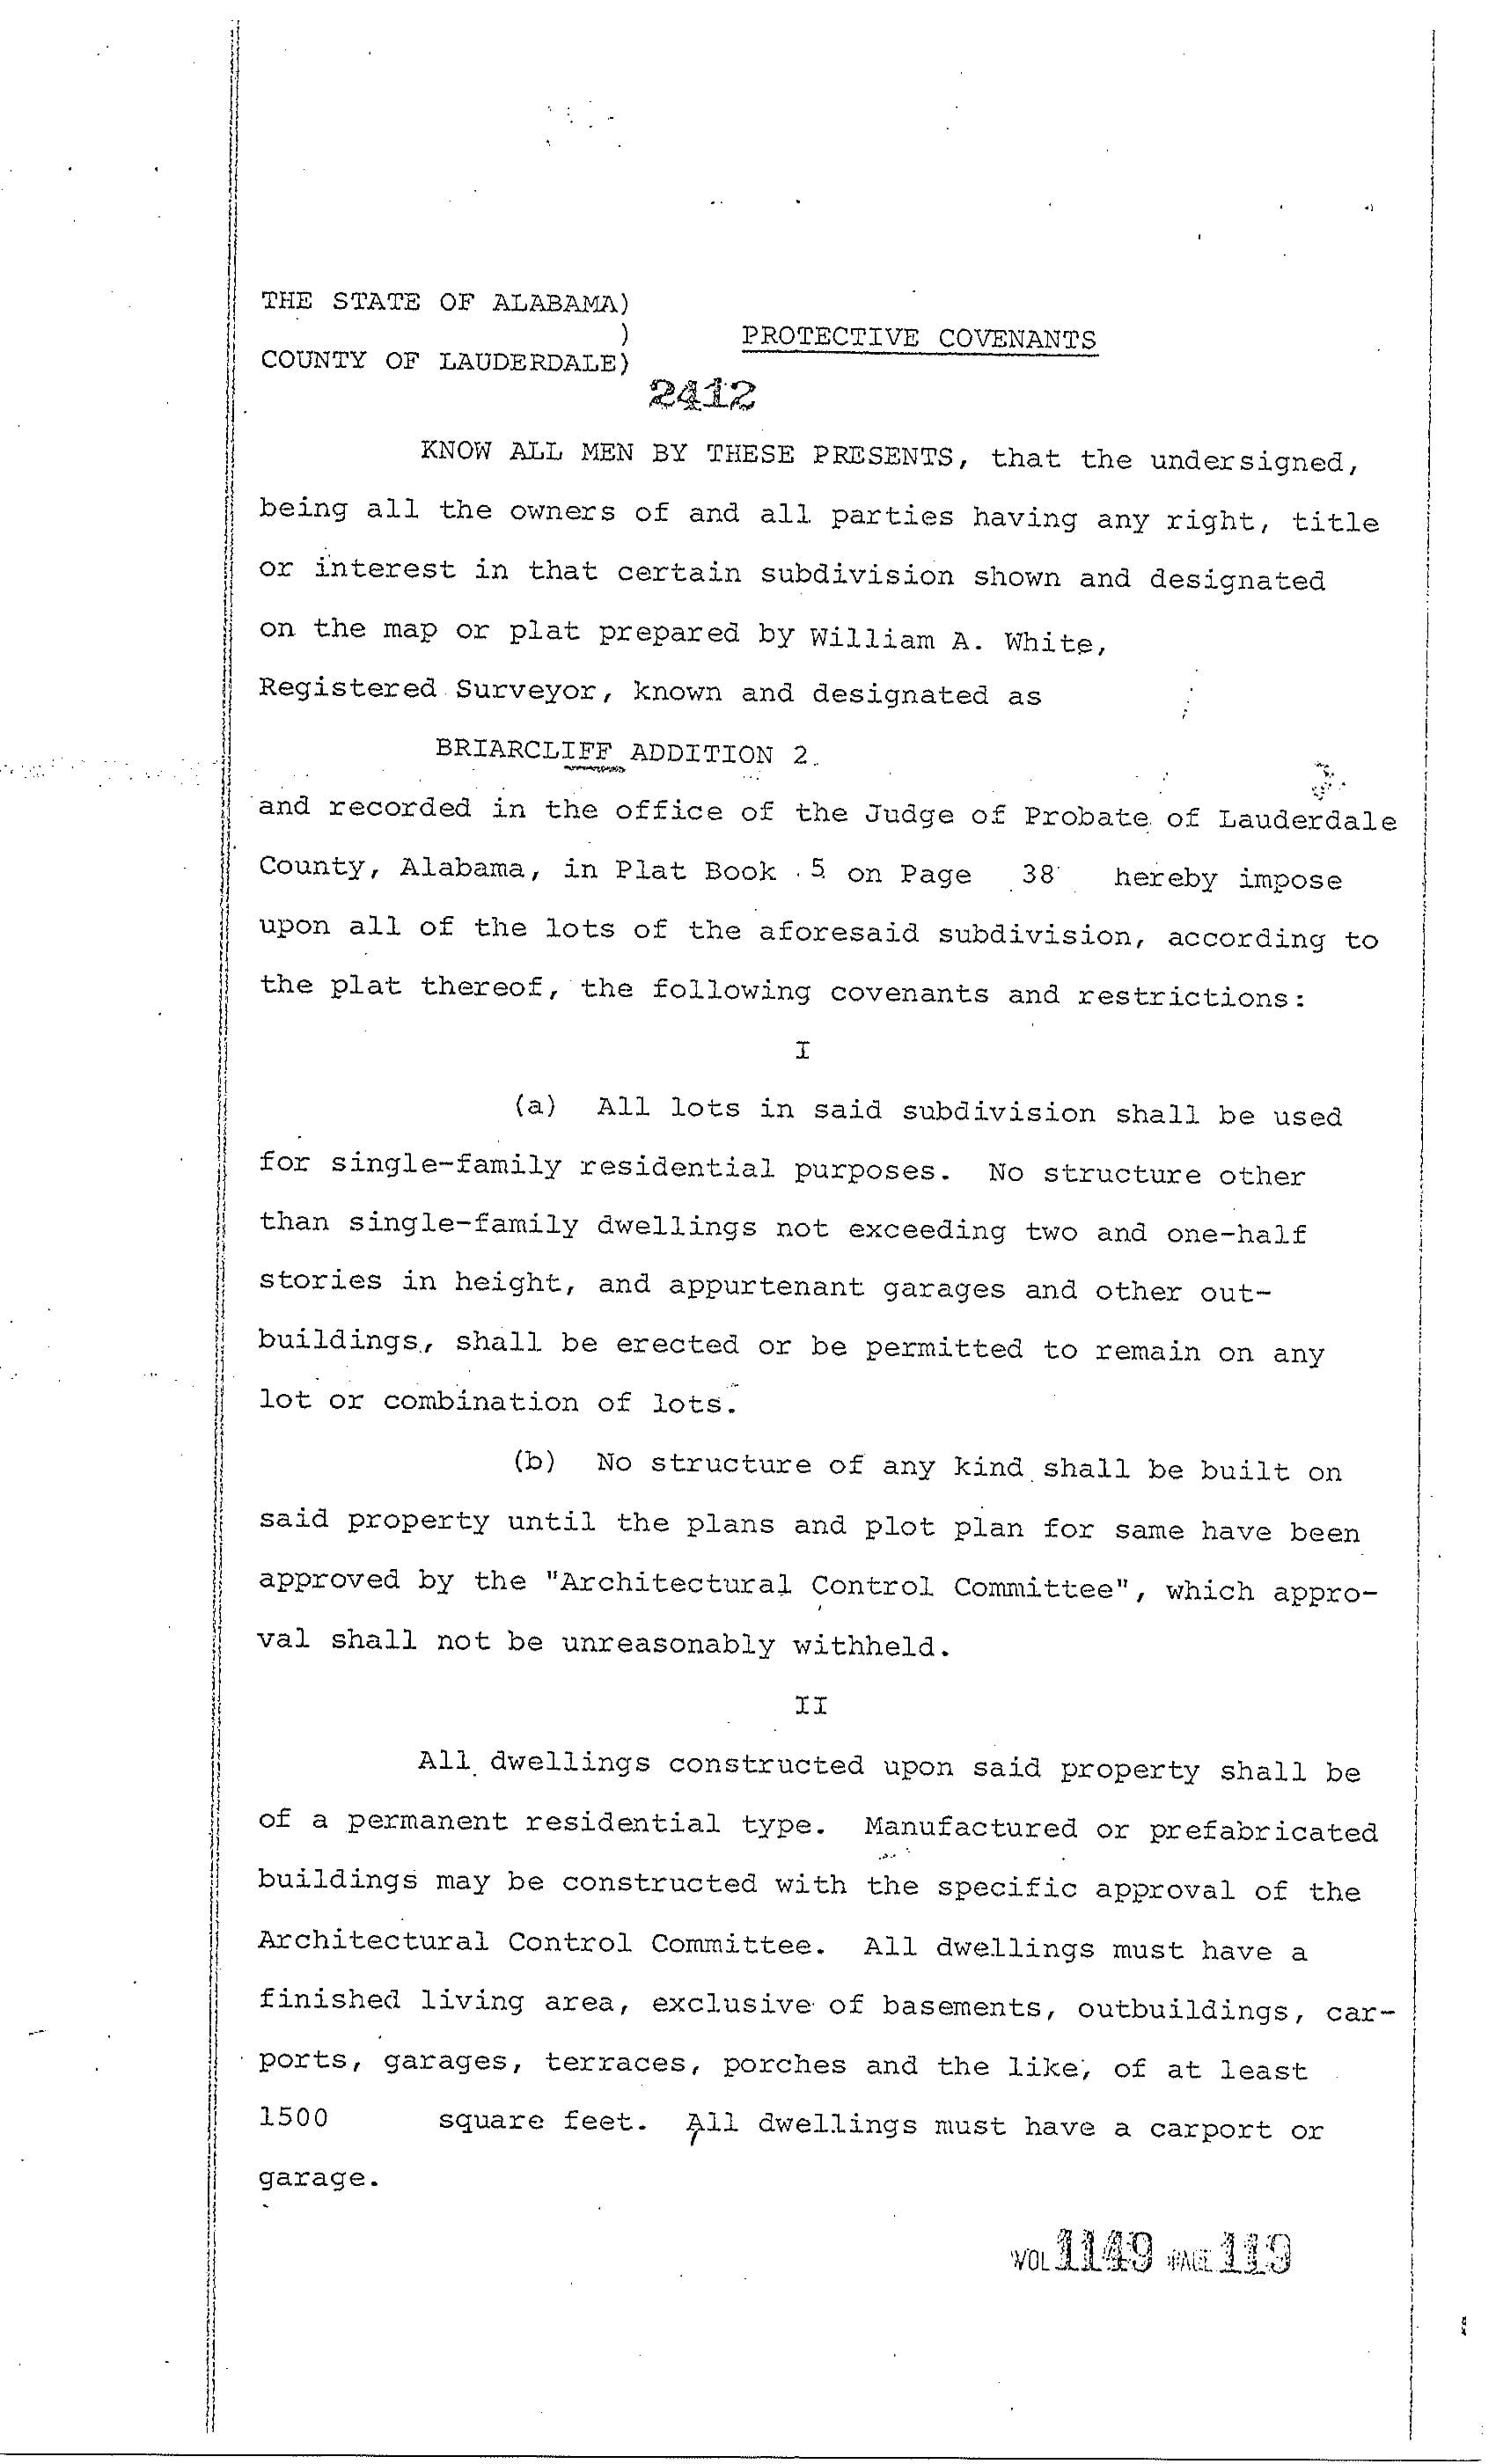 briarcliff 2-covenants-1.jpg